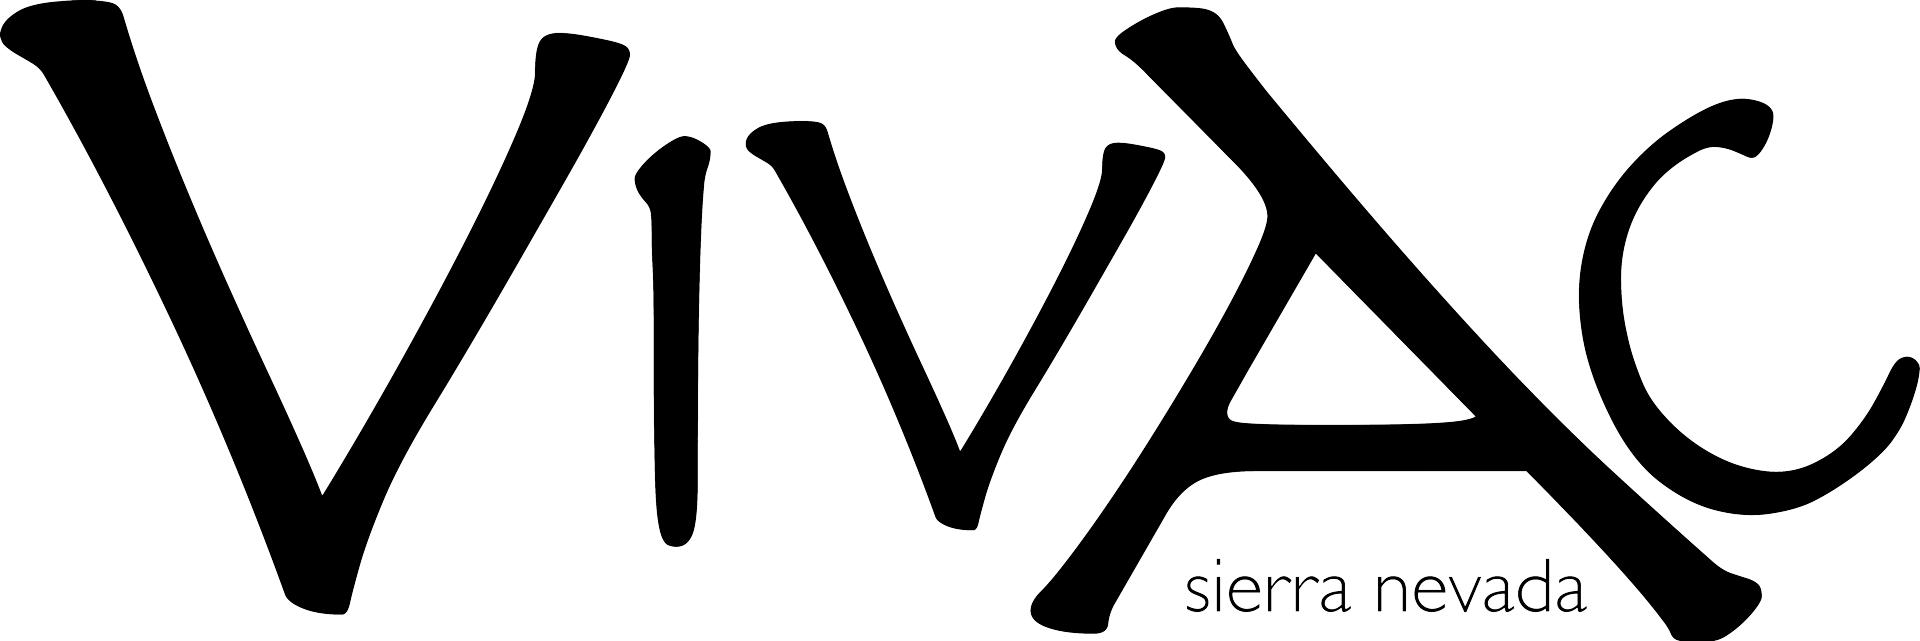 Restaurante Vivac Sierra Nevada